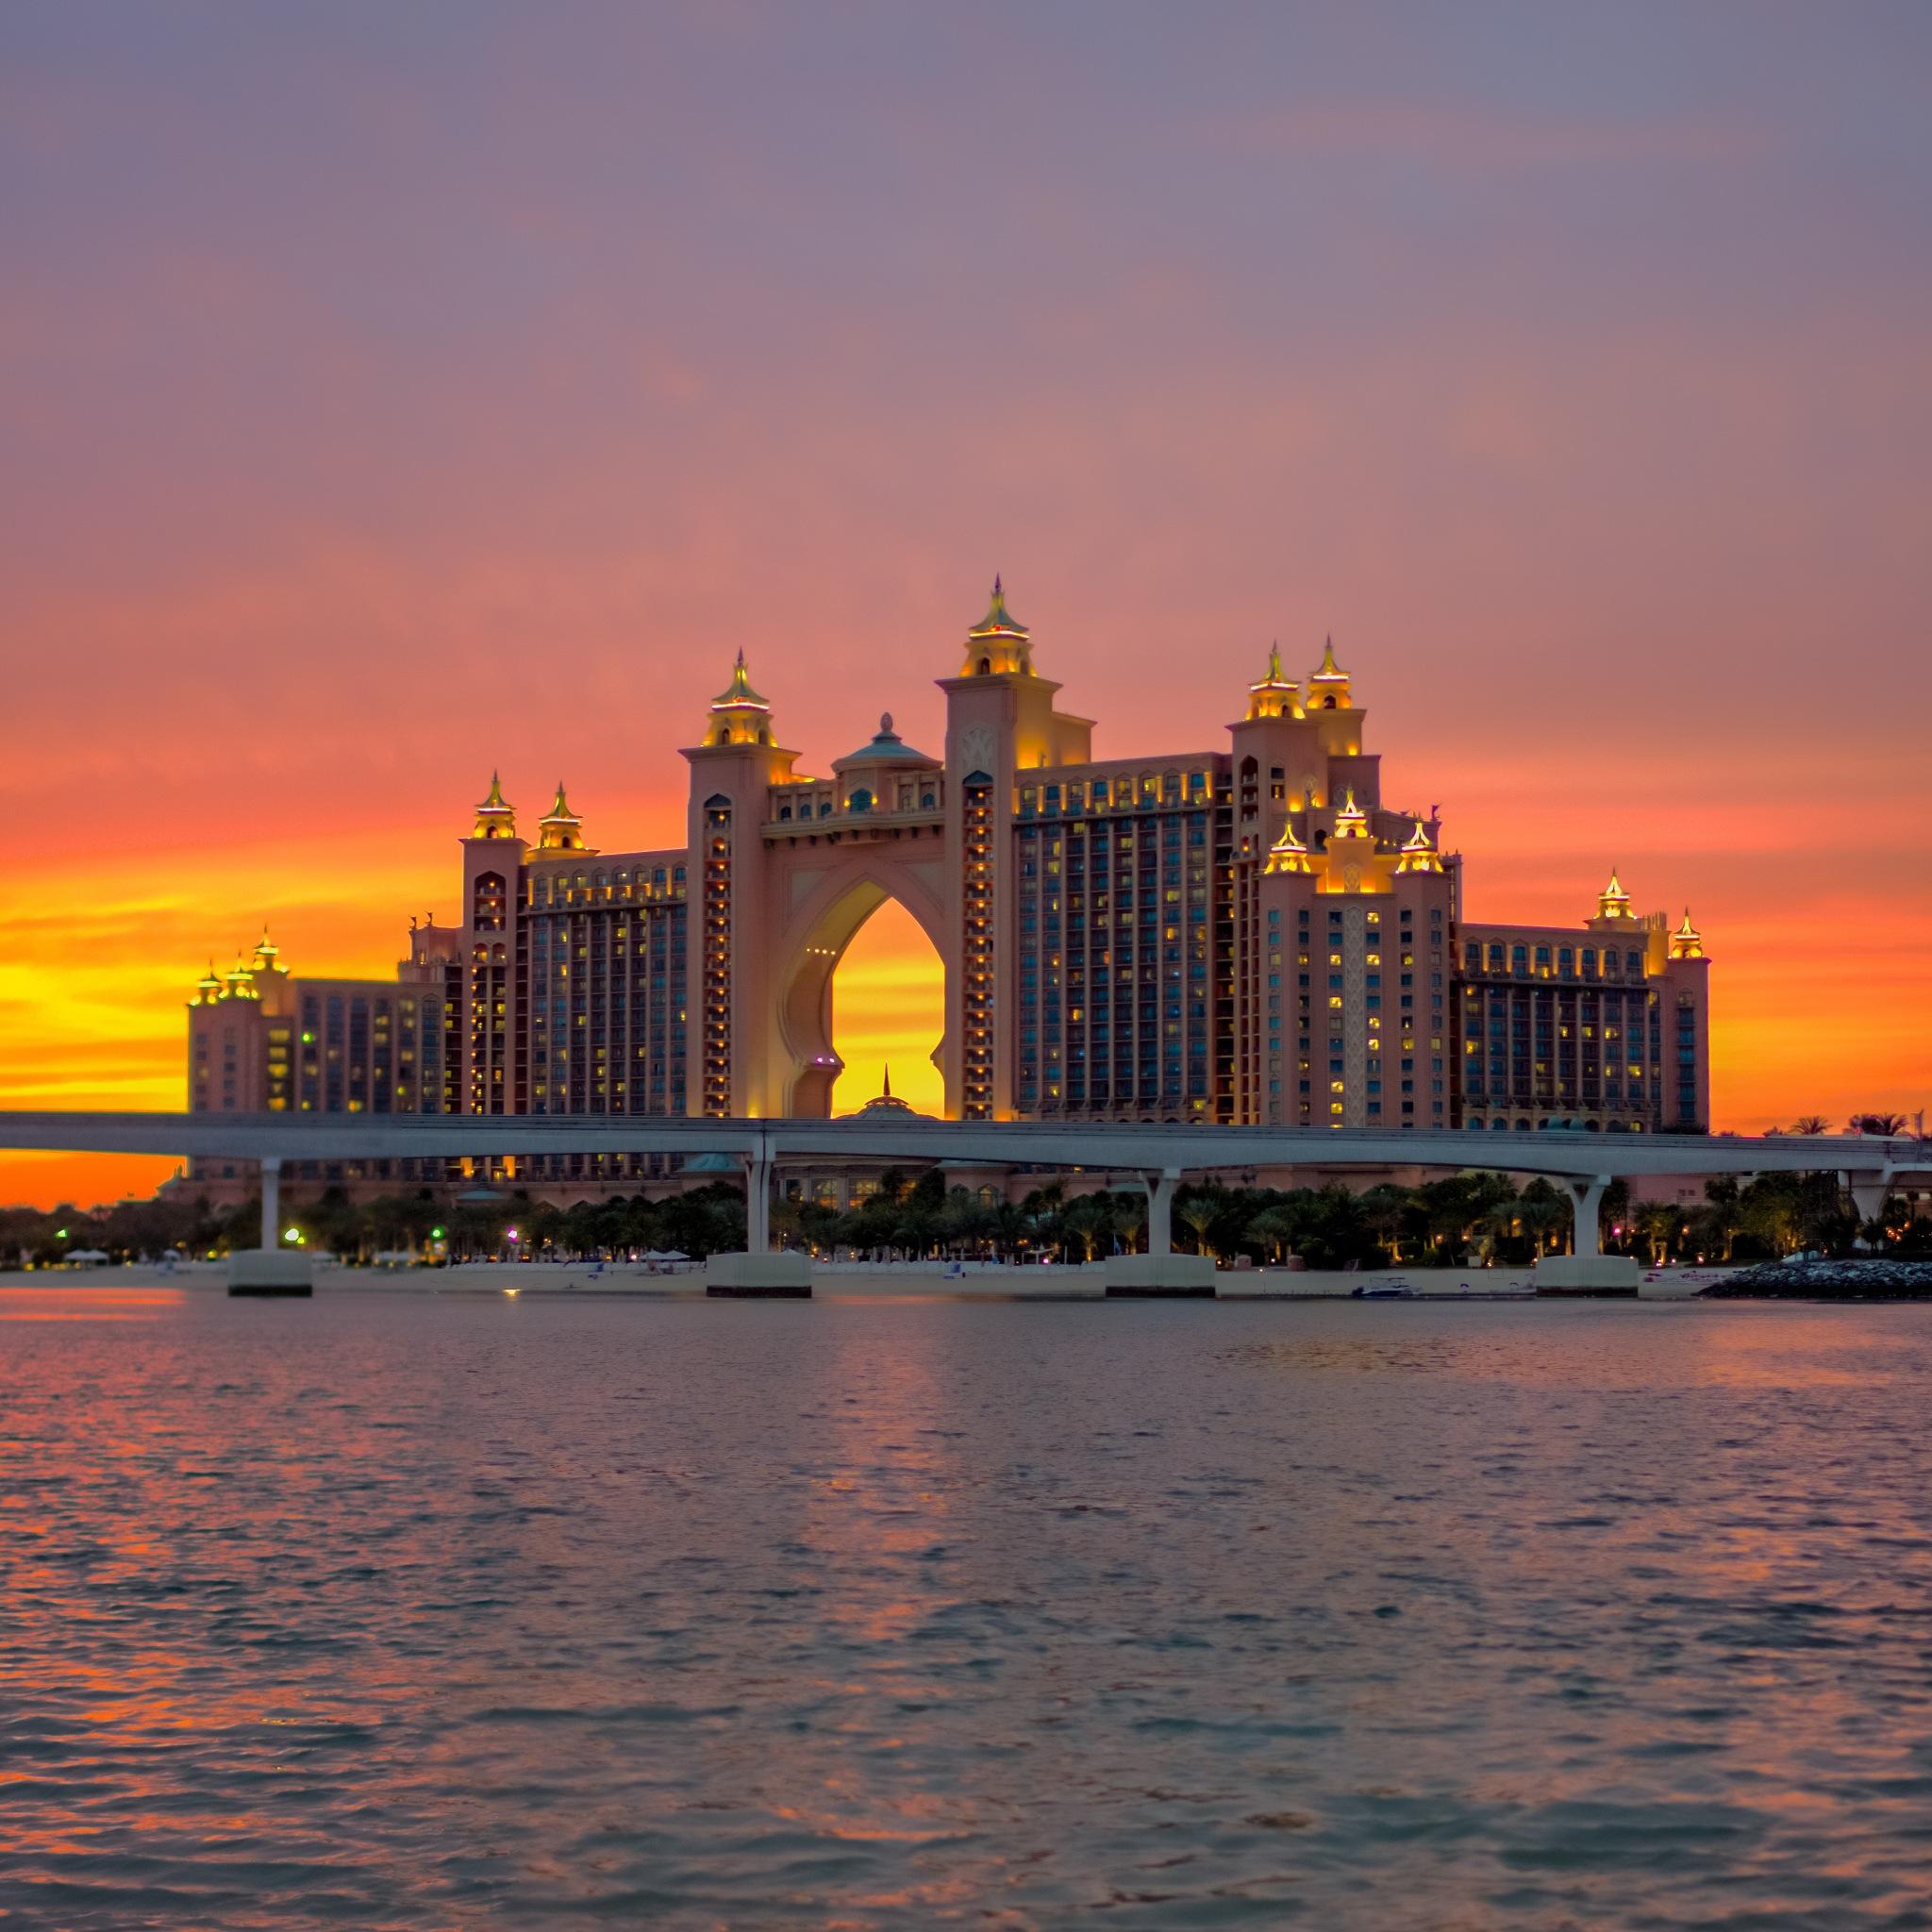 Atlantis Sunset by Wissam Chehade